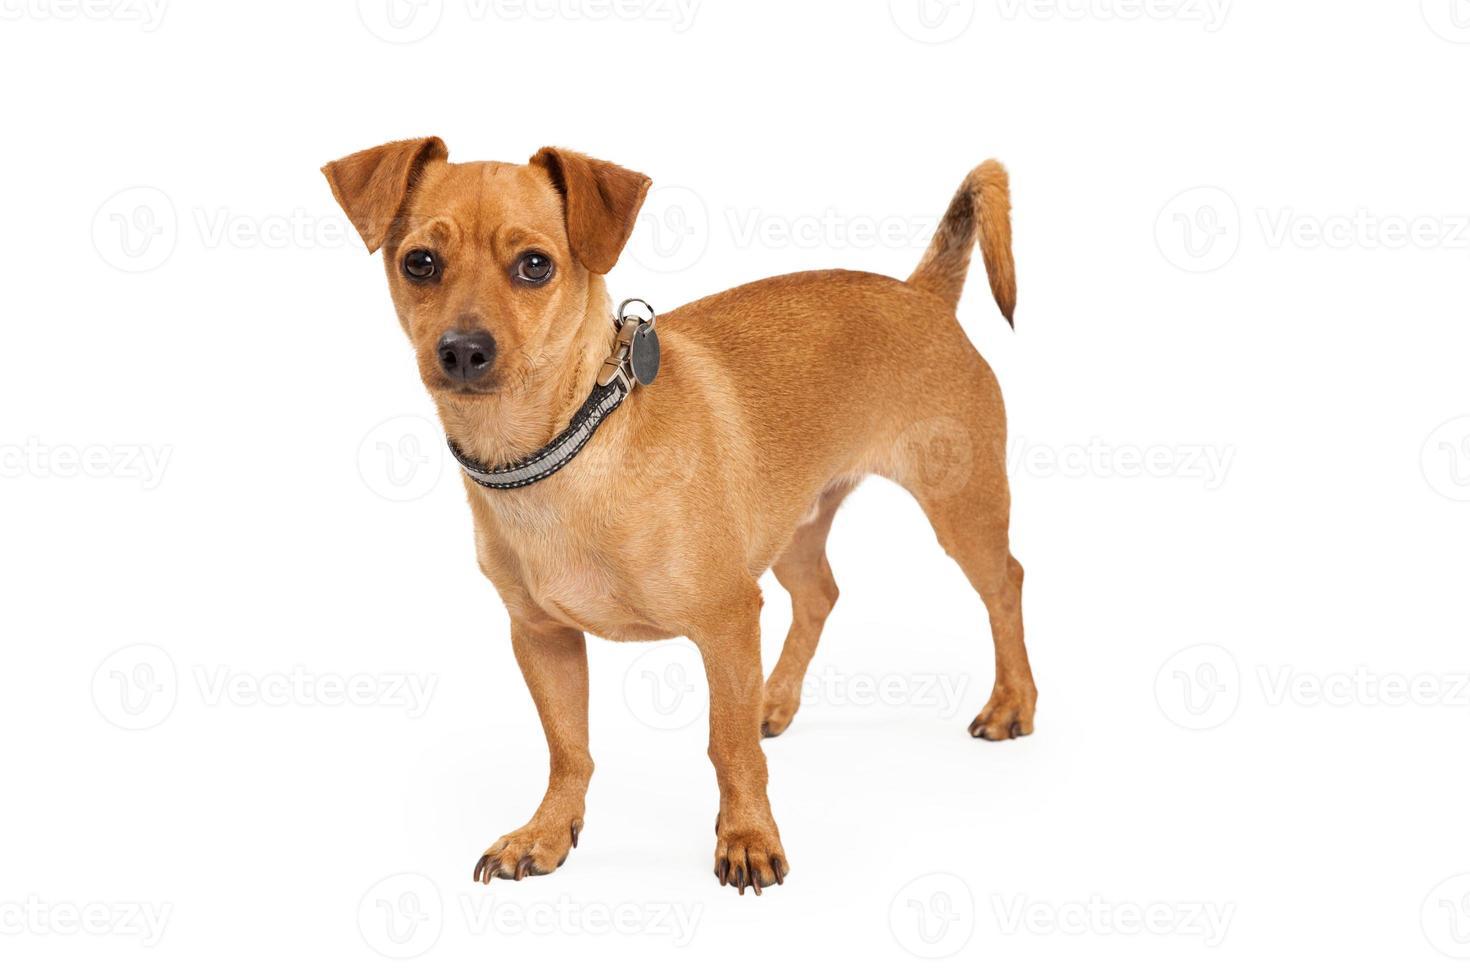 chihuahua perro cruzado de pie foto